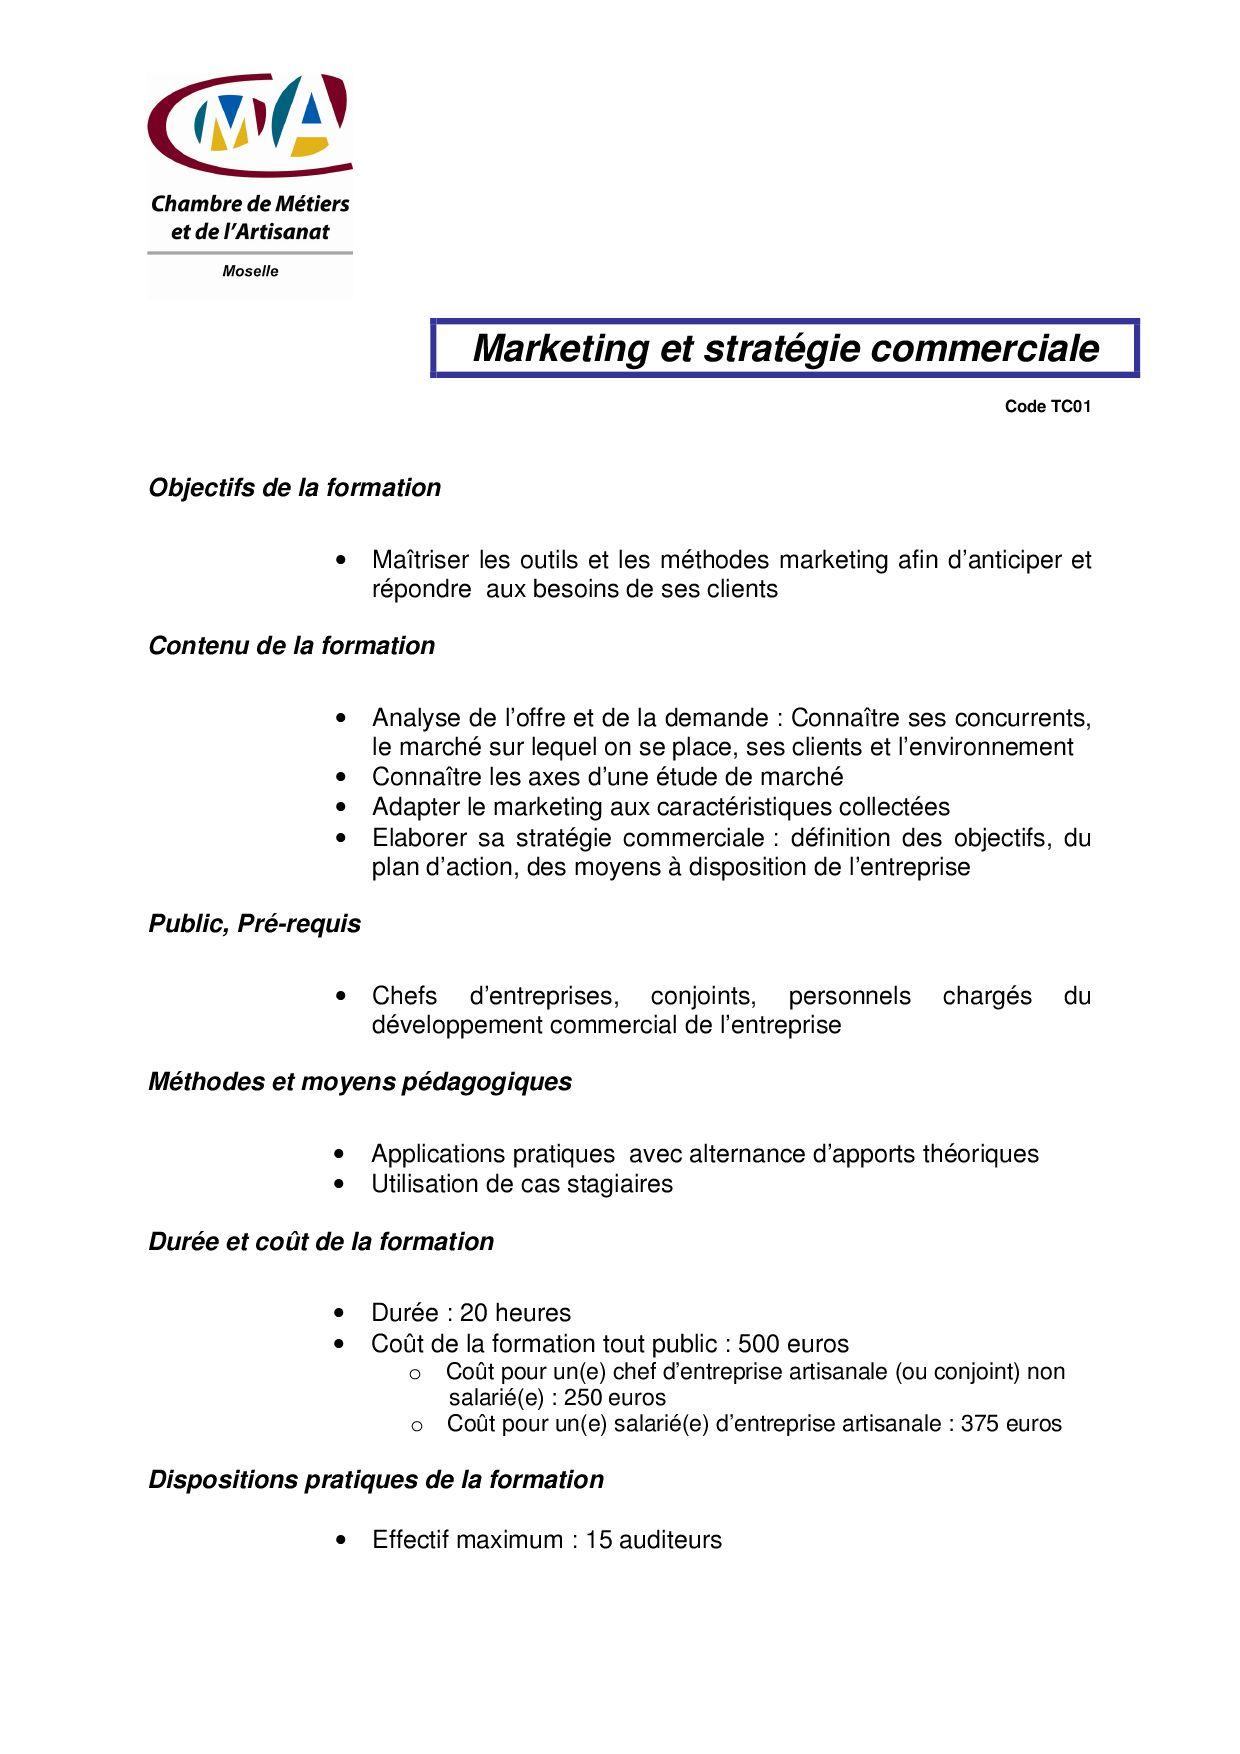 http://www.cma-moselle.fr/files/Marketing%20et%20strat%C3%83 ...